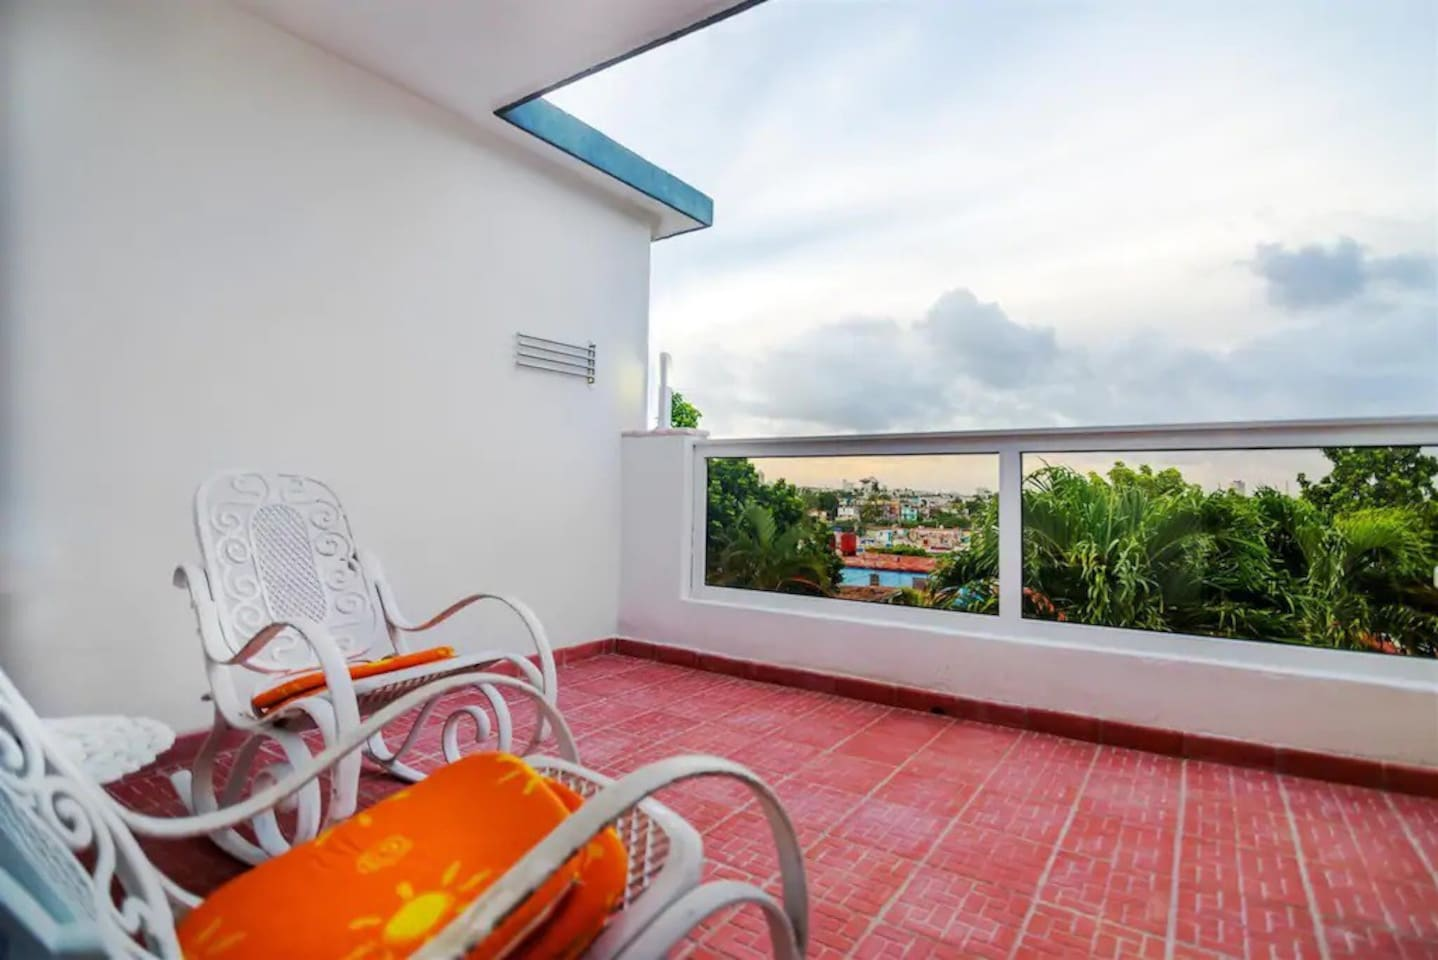 Apartment Villa Don Teto Suite   8 Rooms  Great Havana View photo 16585160